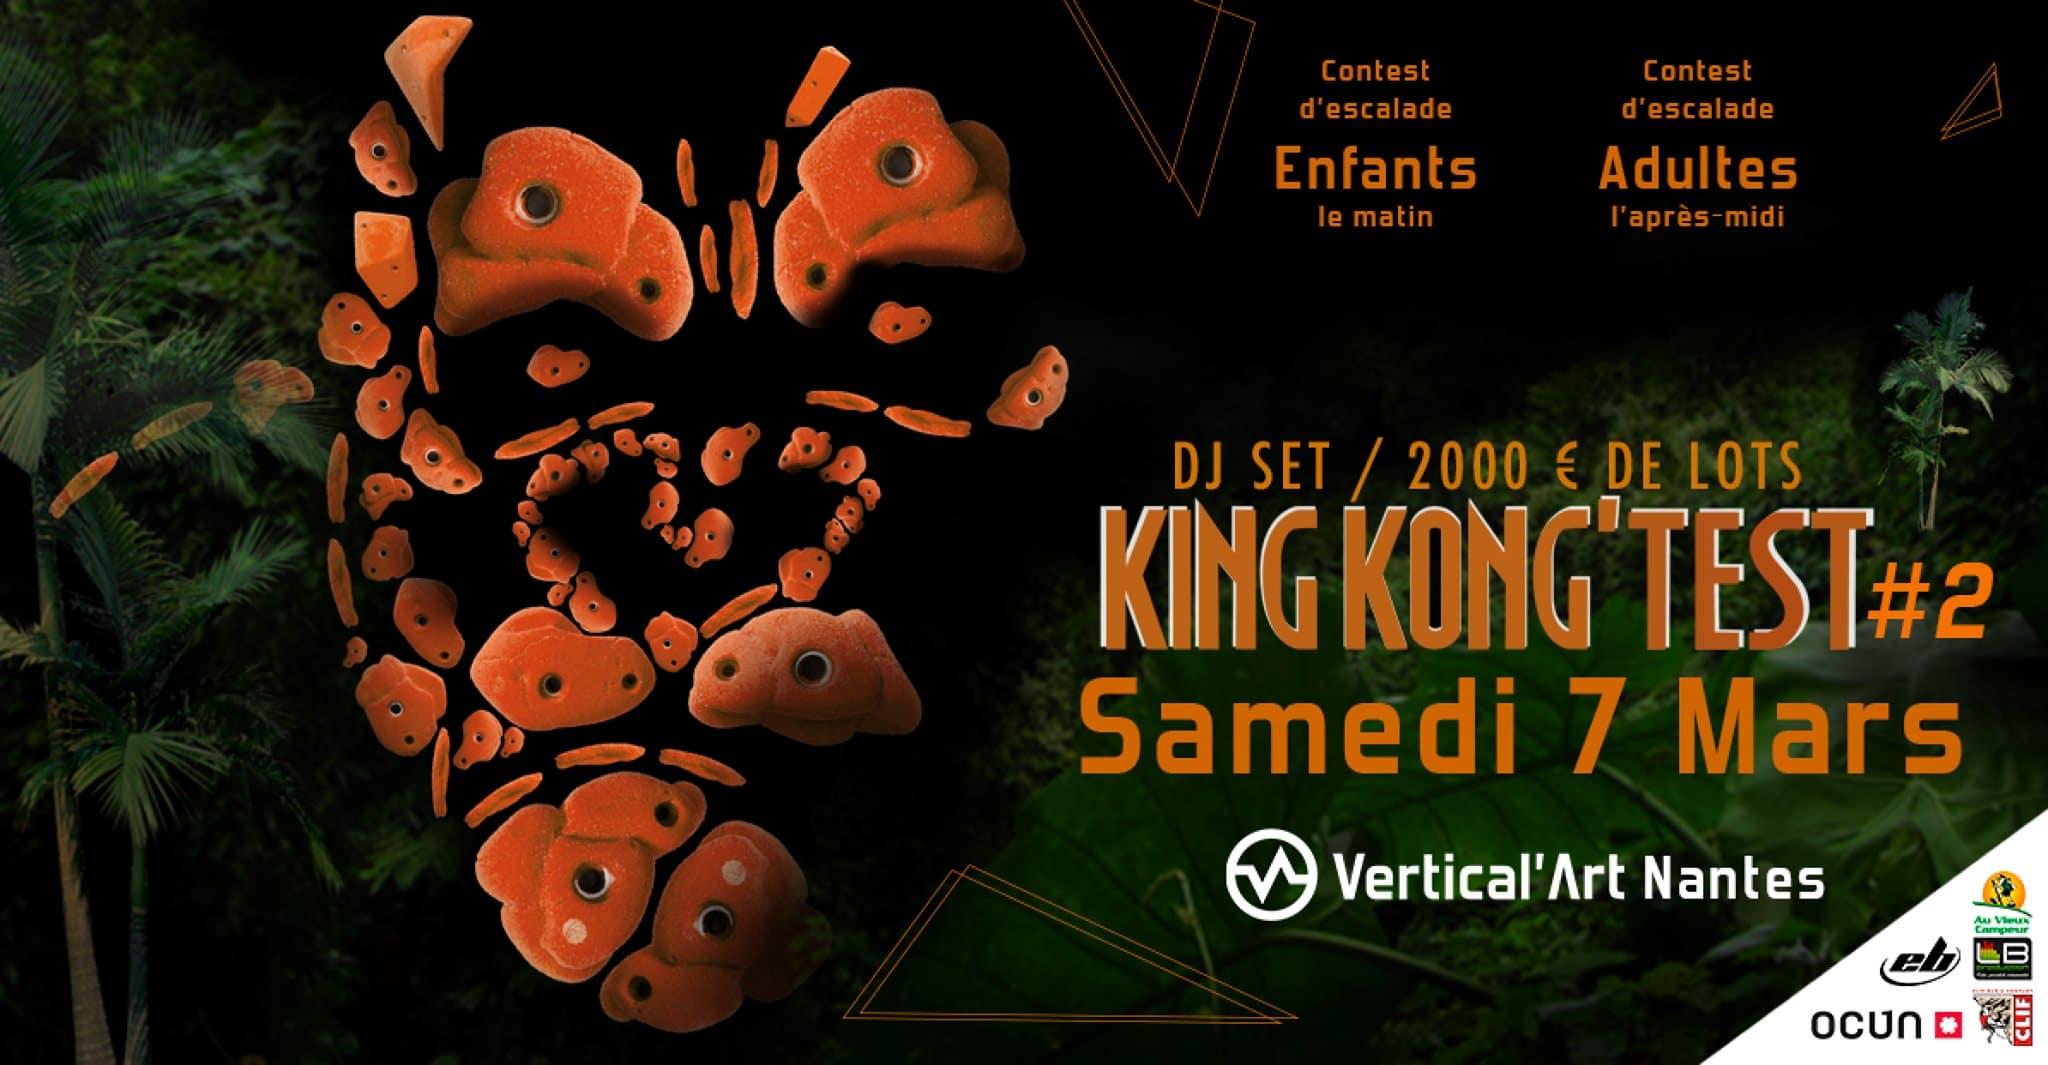 Samedi 7 mars -Contest d'escalade de bloc - Kingkong'test Vertical'art nantes - salle d'escalade de blocs - Salle de grimpe Nantes- Bar restaurant -salle de musculation vertical'art - Bloc Empire state building -